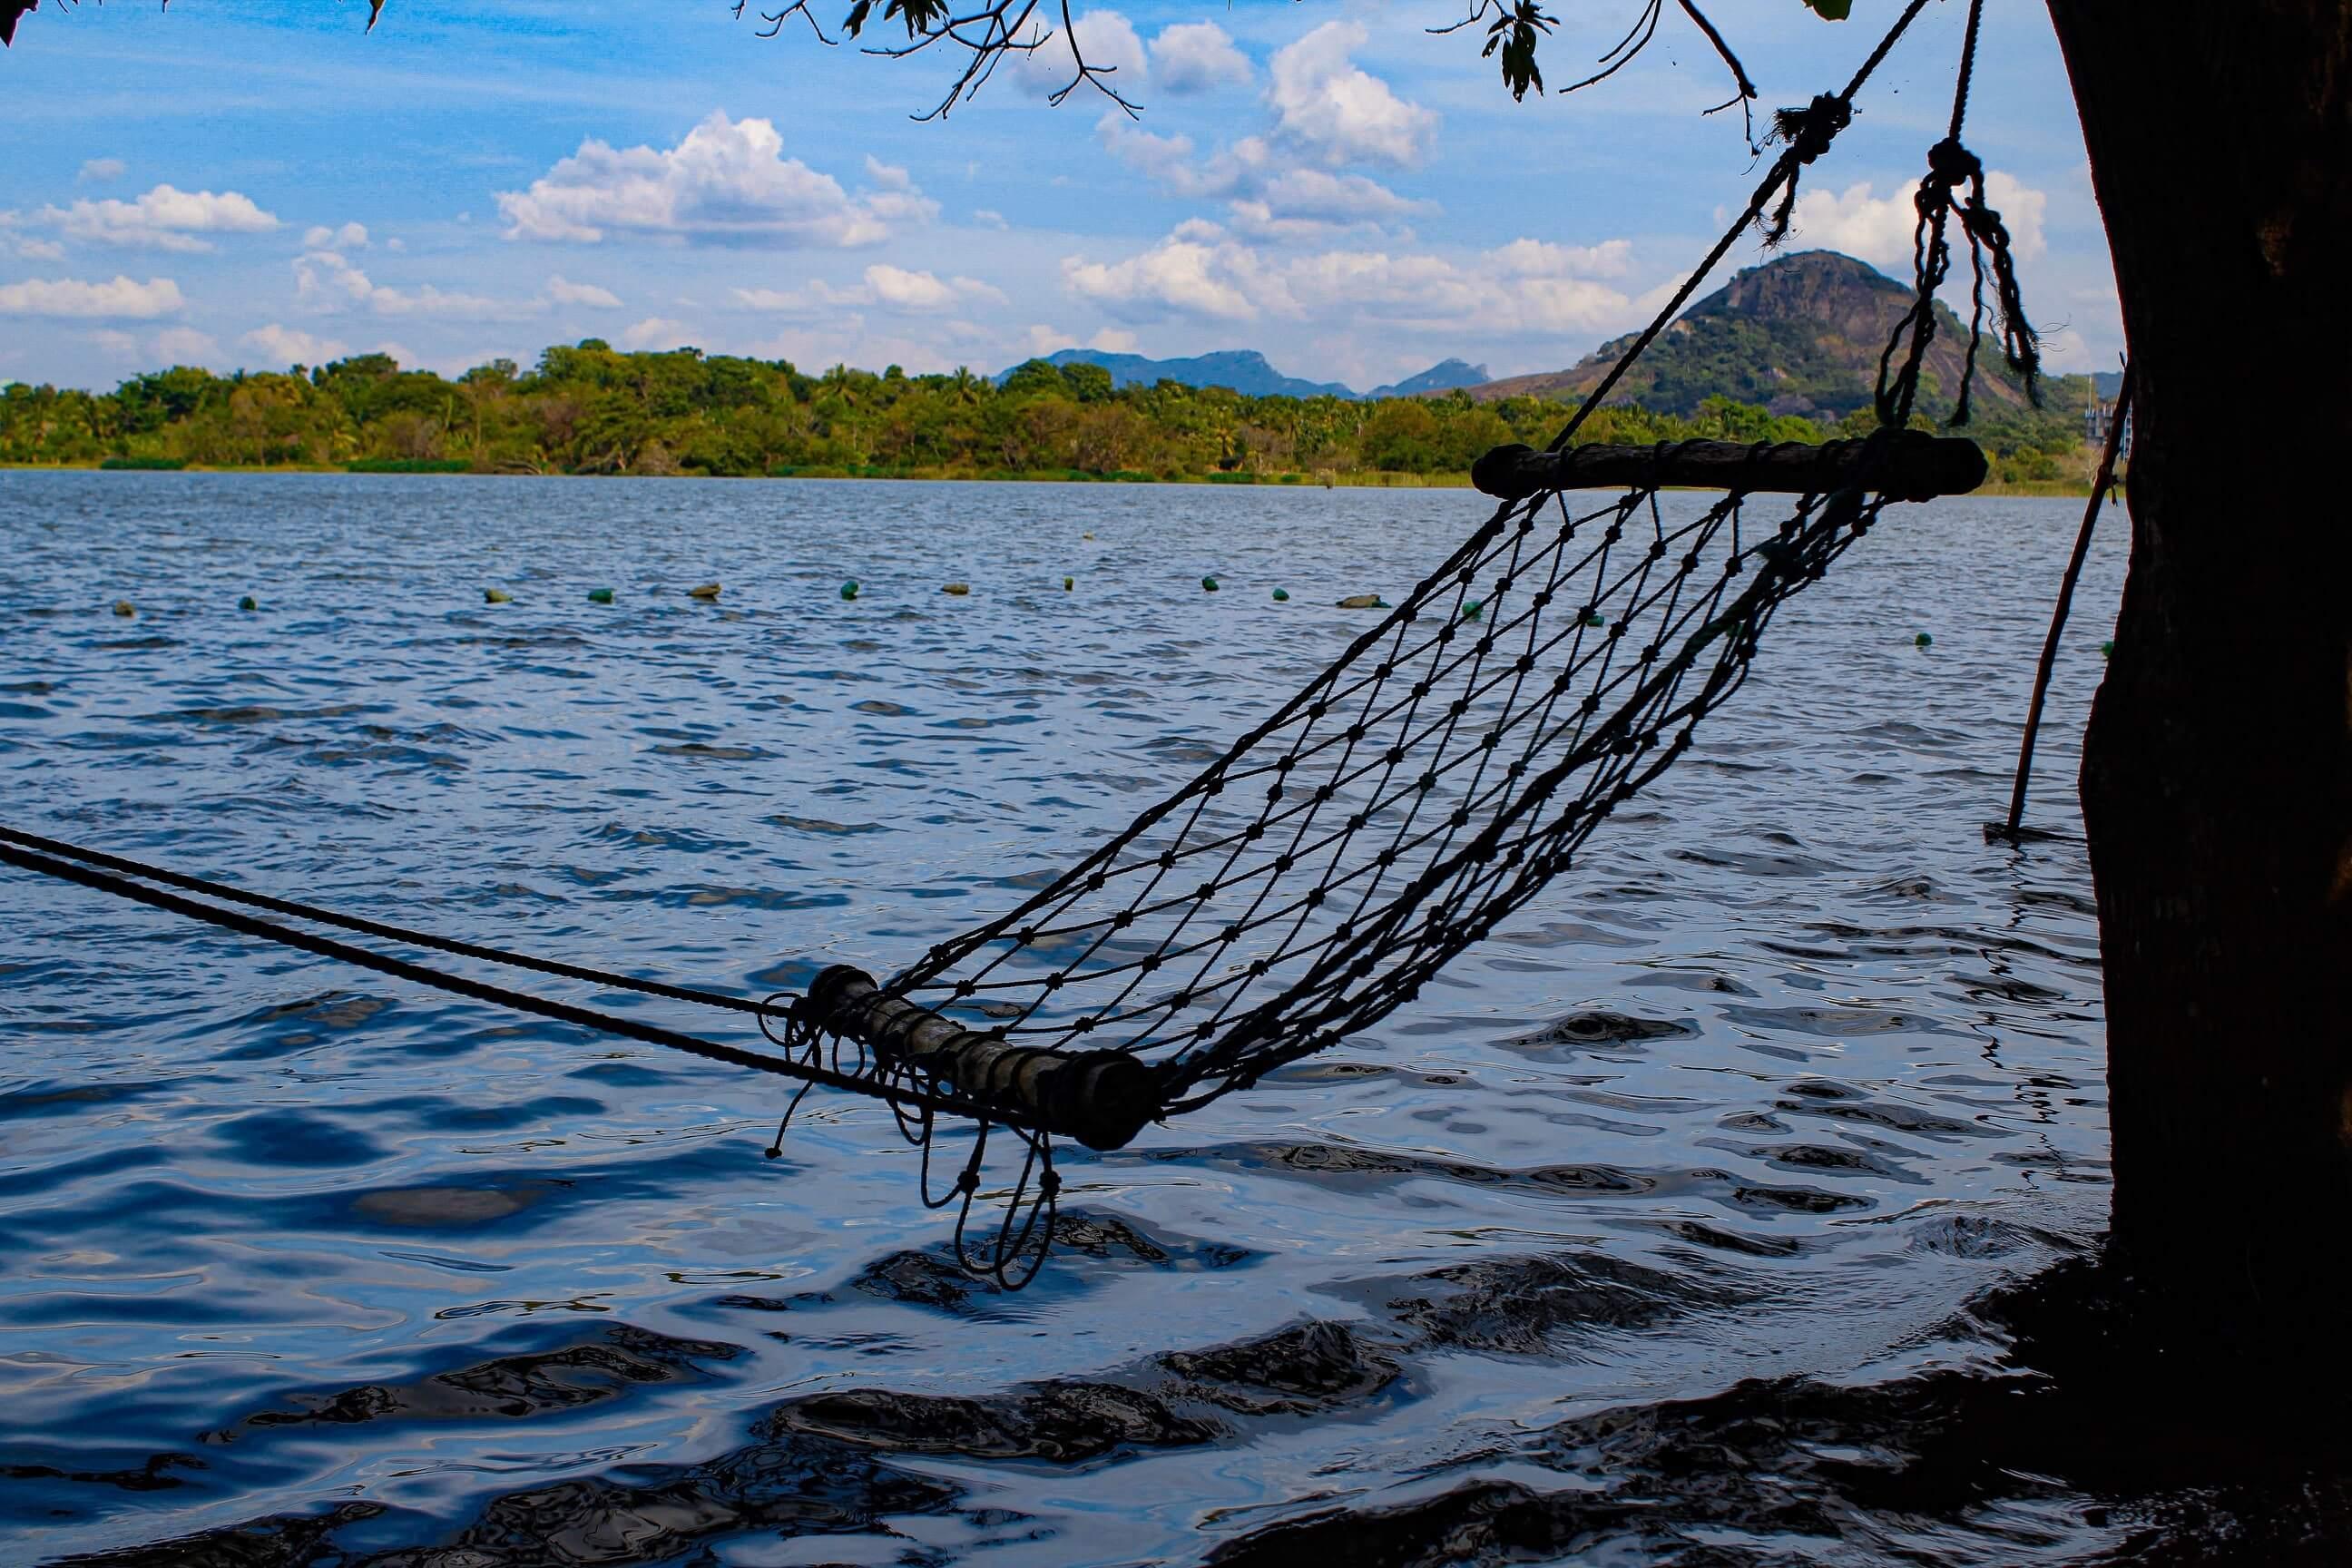 Oya Reservoir and Pleasure Island